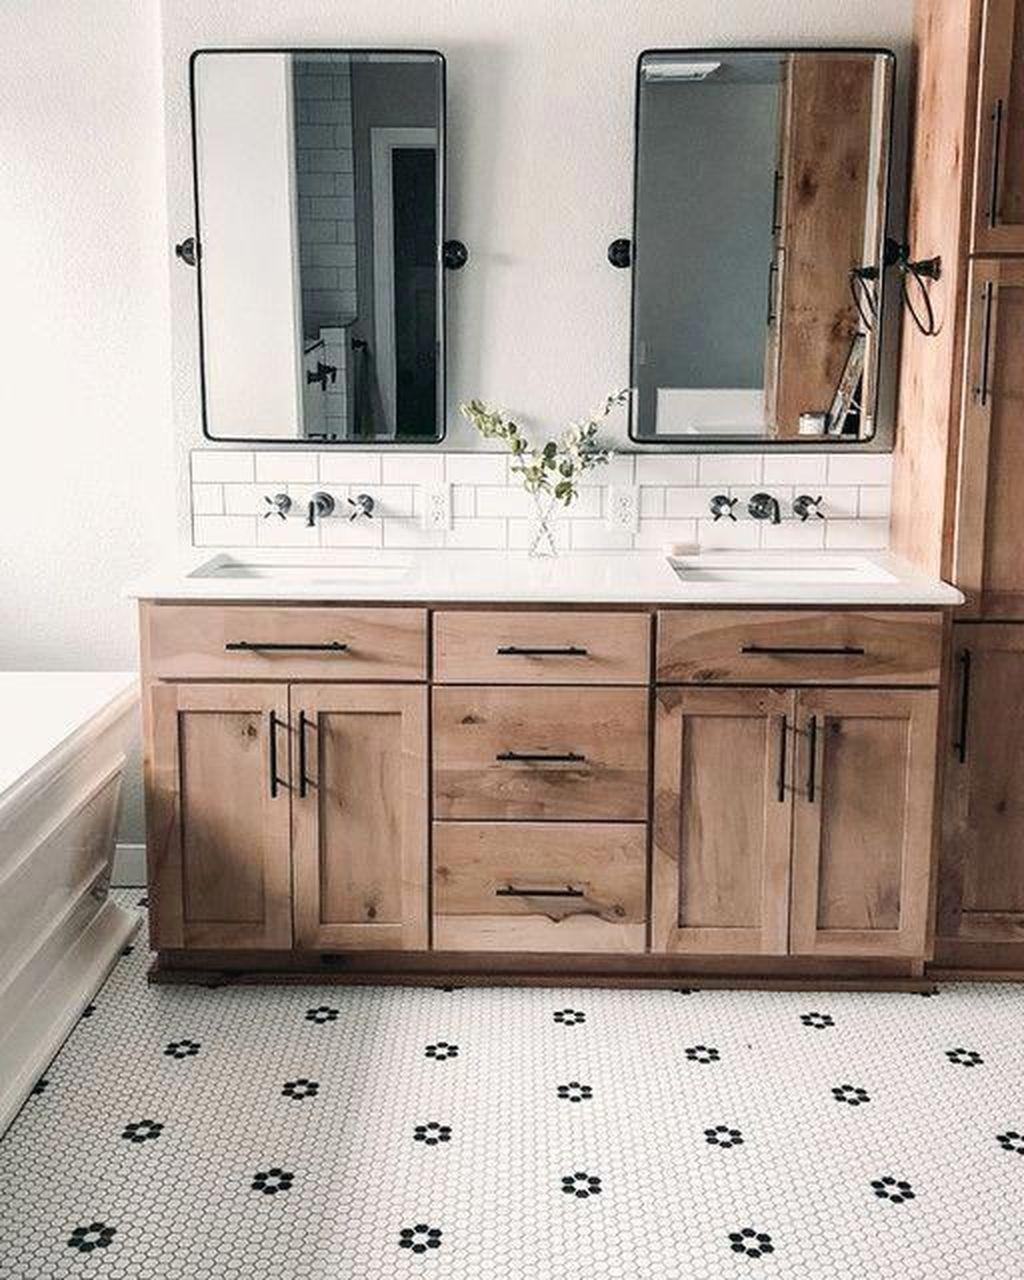 Admirable Rustic Modern Bathroom Design And Decor Ideas 07